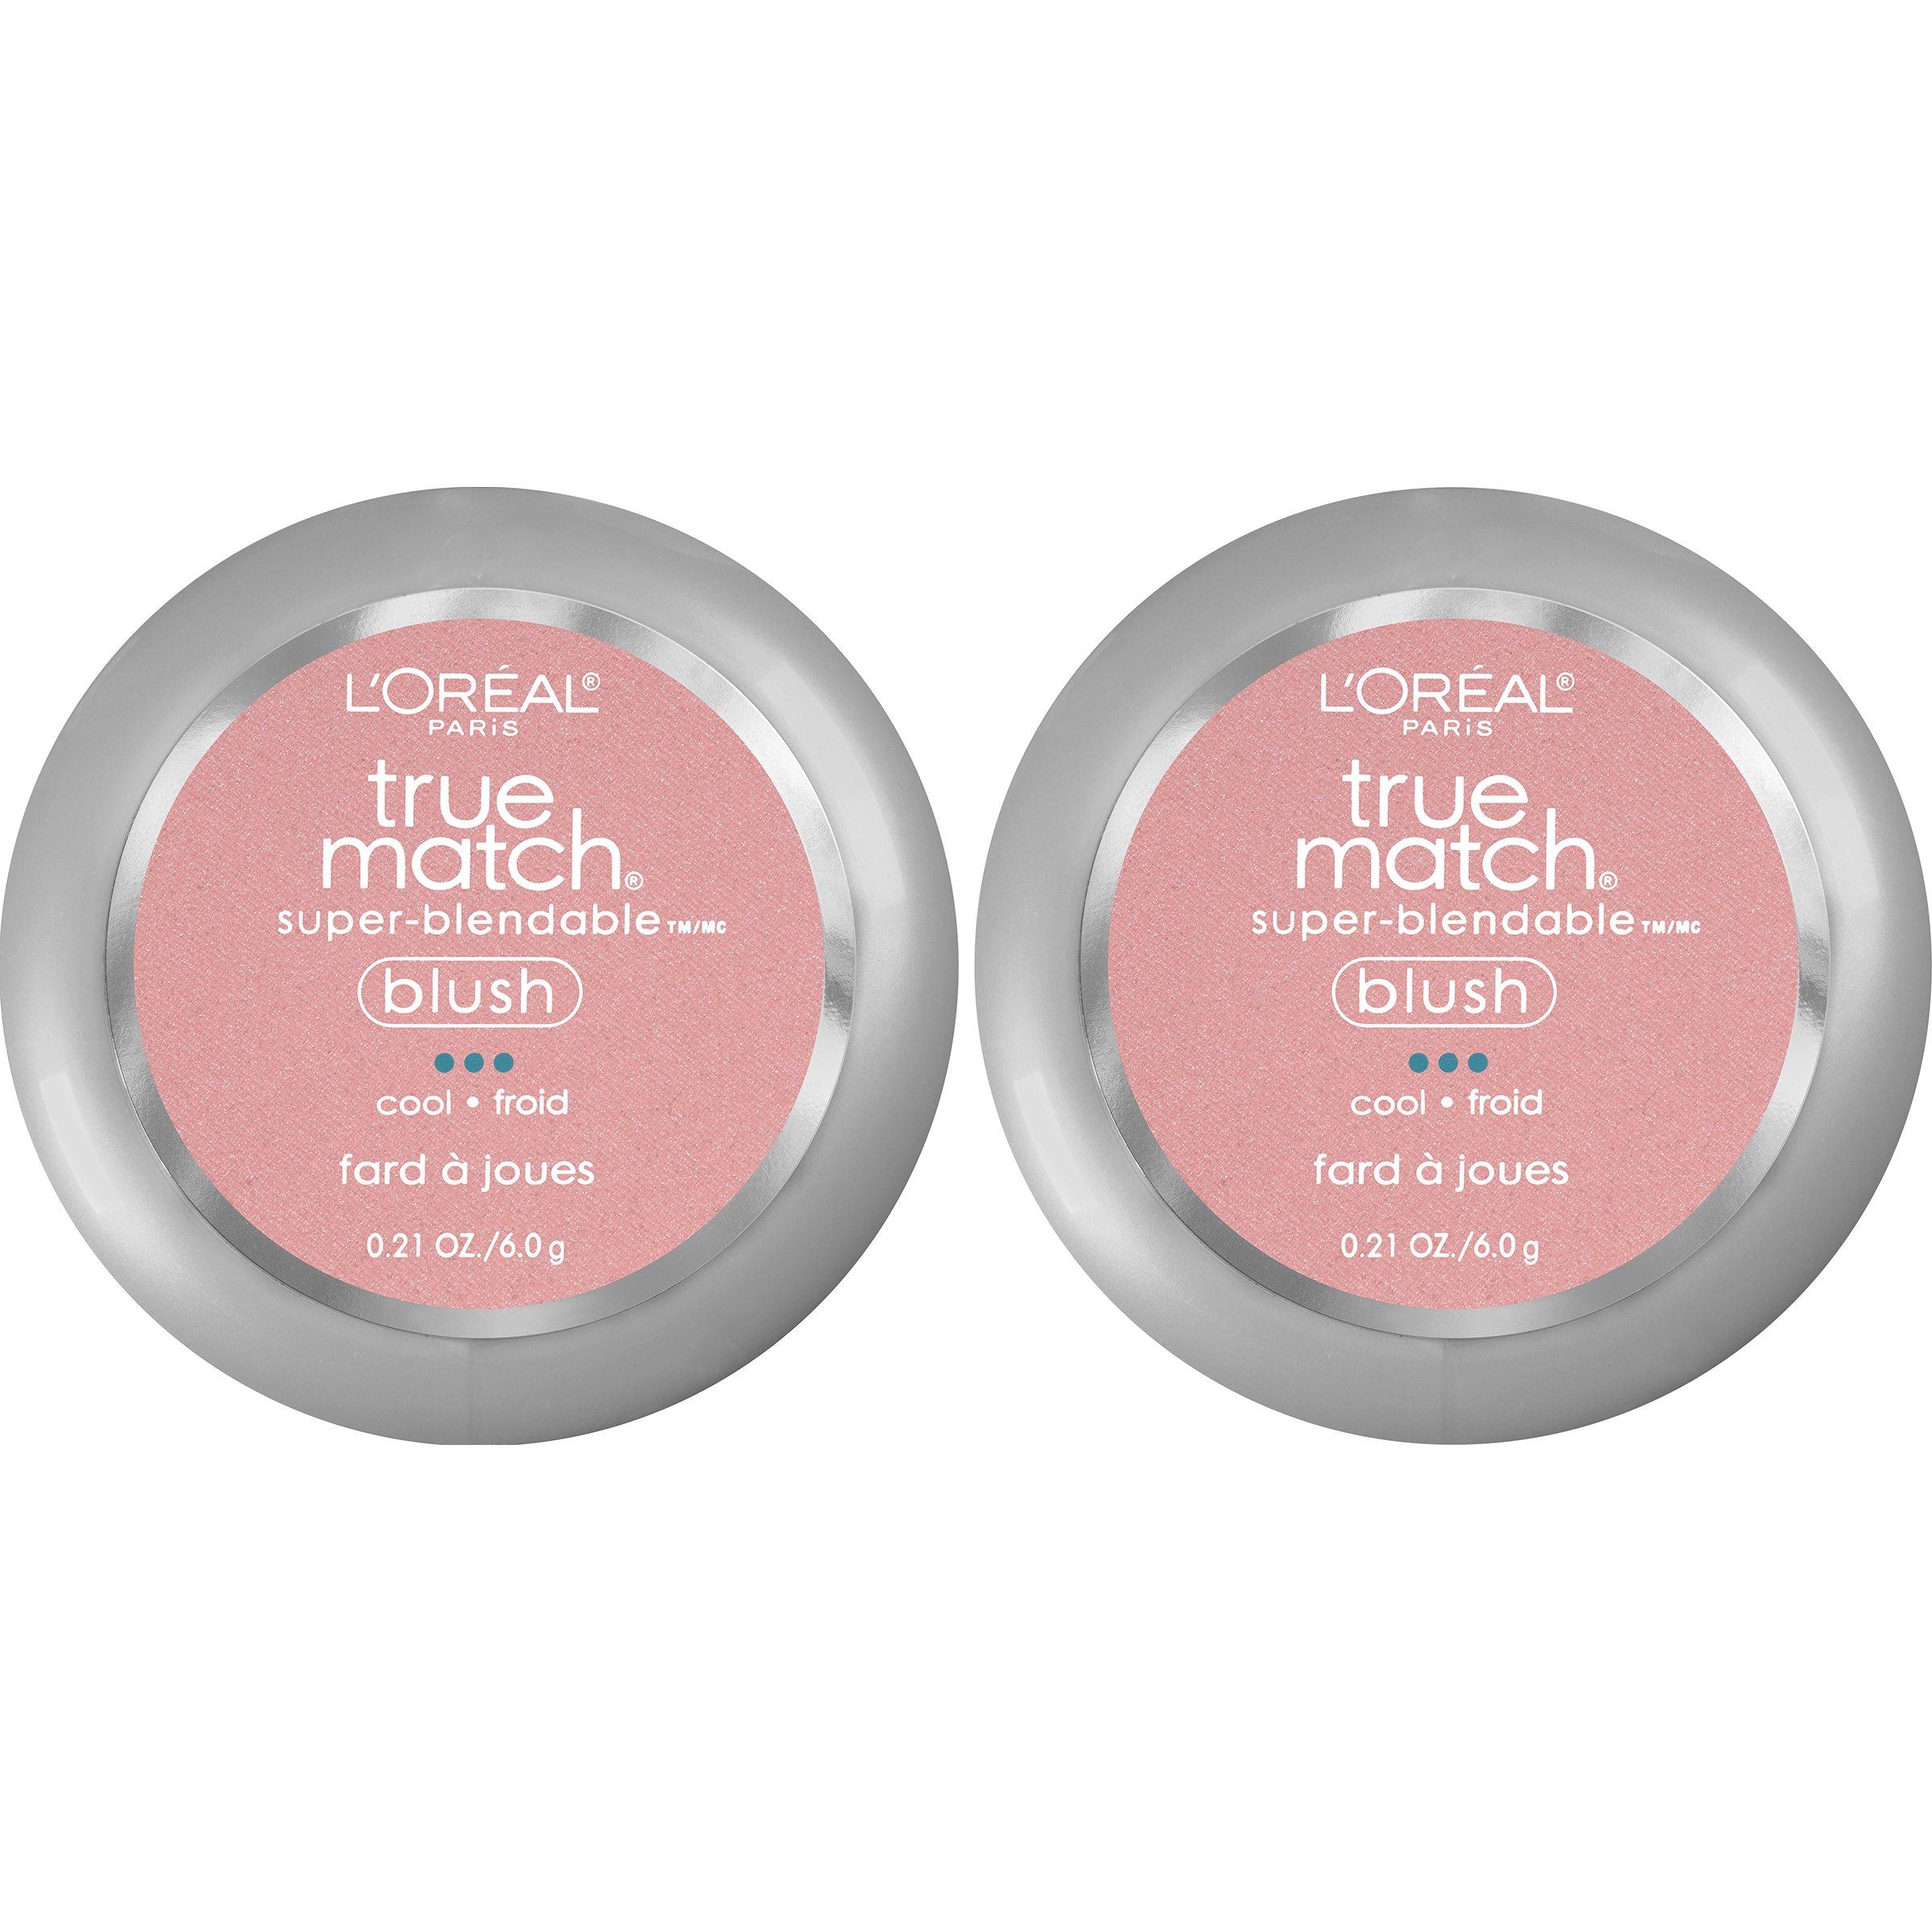 L'Oreal Paris Cosmetics True Match Super-Blendable Blush, Tender Rose, 2 Count